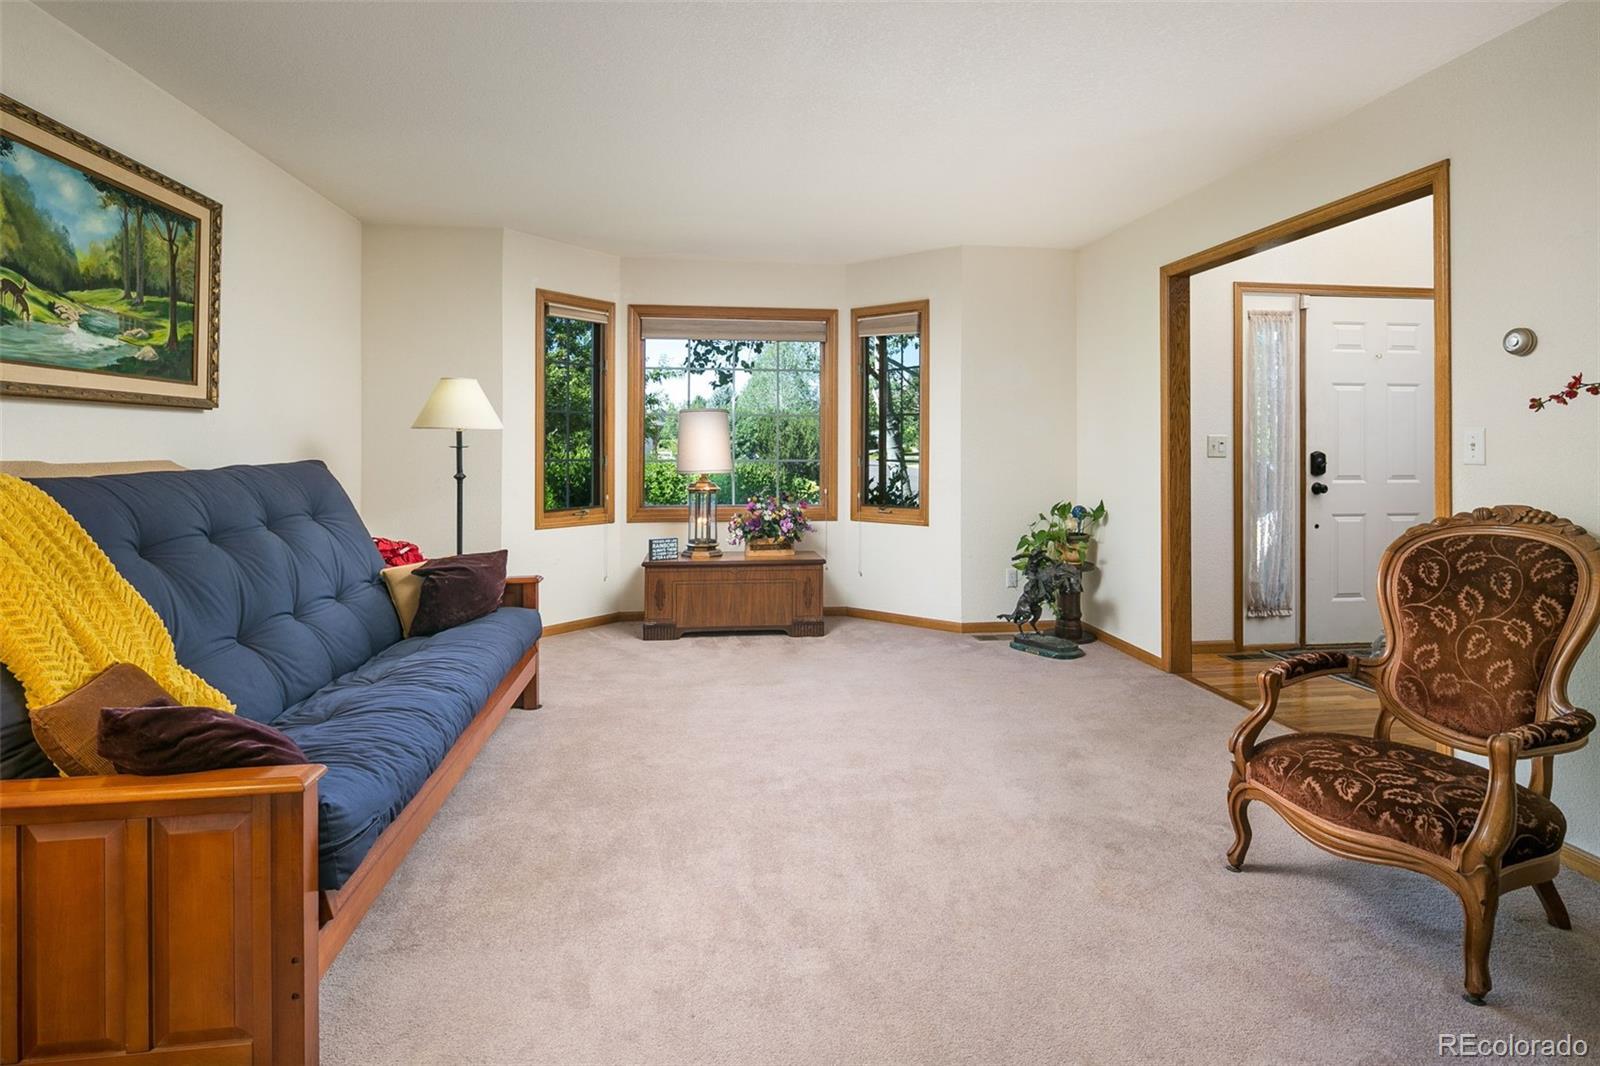 MLS# 8169668 - 4 - 7876 Hathaway Lane, Fort Collins, CO 80528